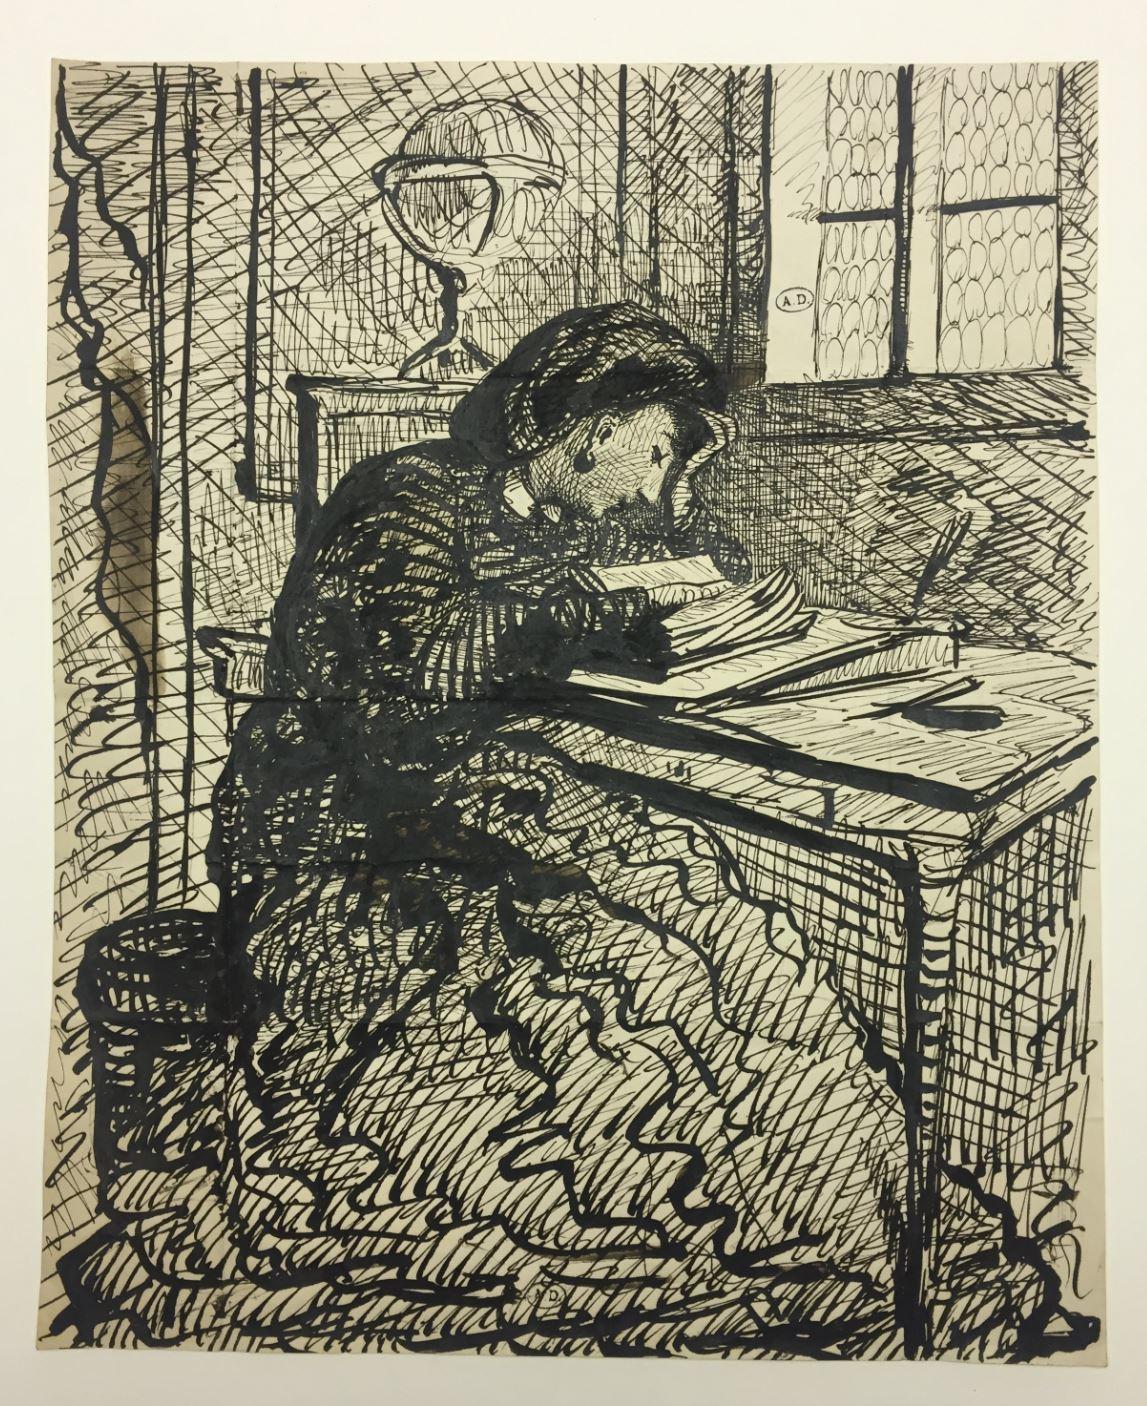 Juie Duvidal ecrivant Leopold Armand Hugo copyright Musee des Arts Decoratifs Paris JPG